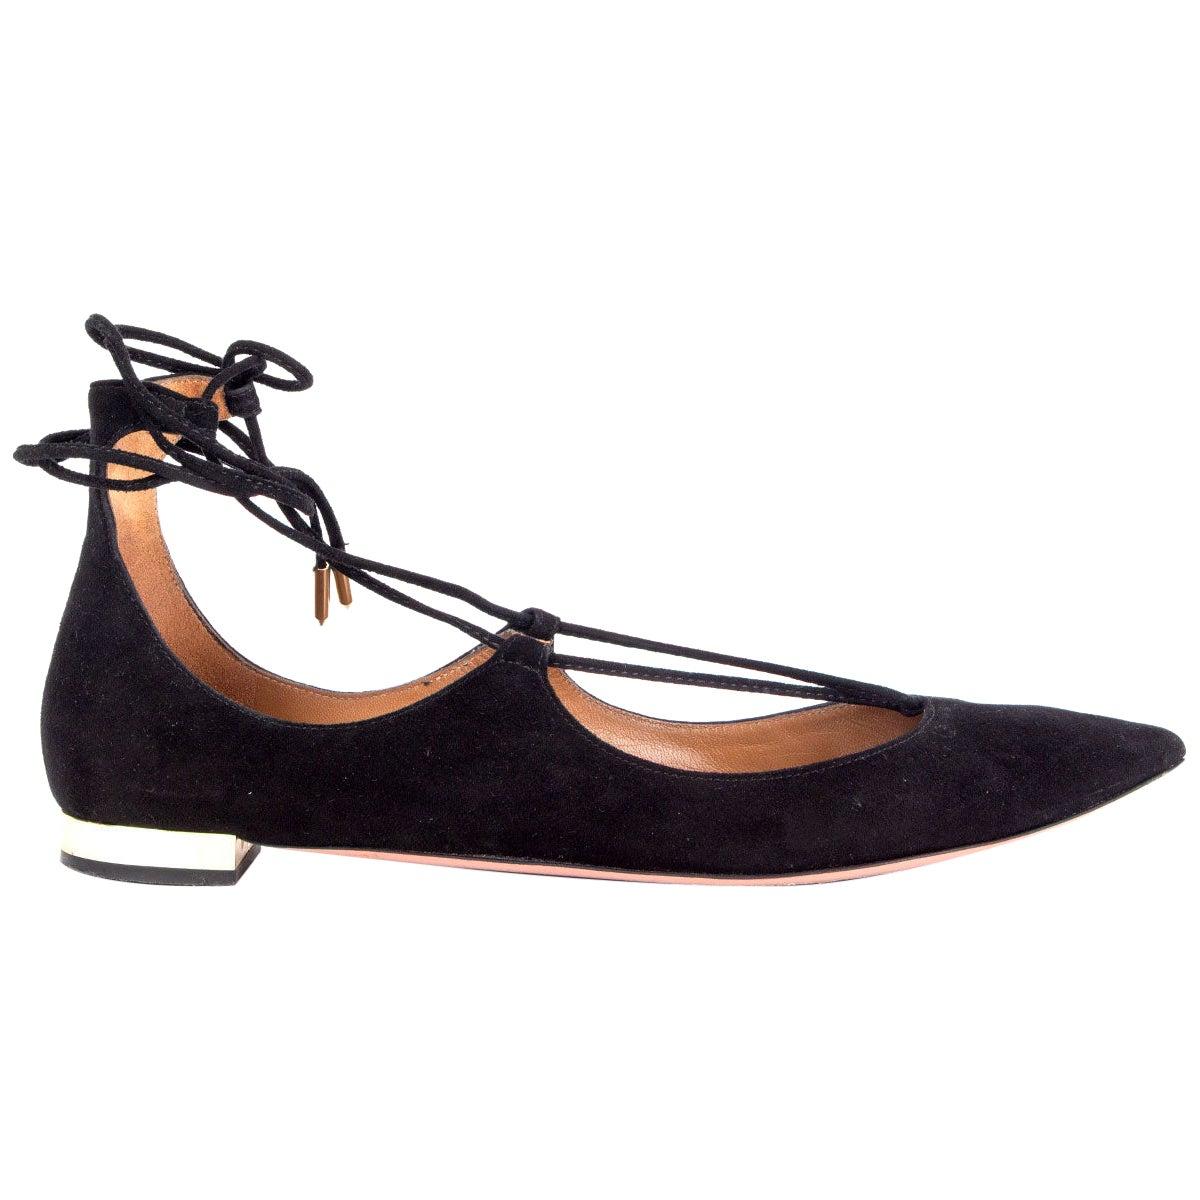 AQUAZZURA black suede Lace Up Flats Shoes 38